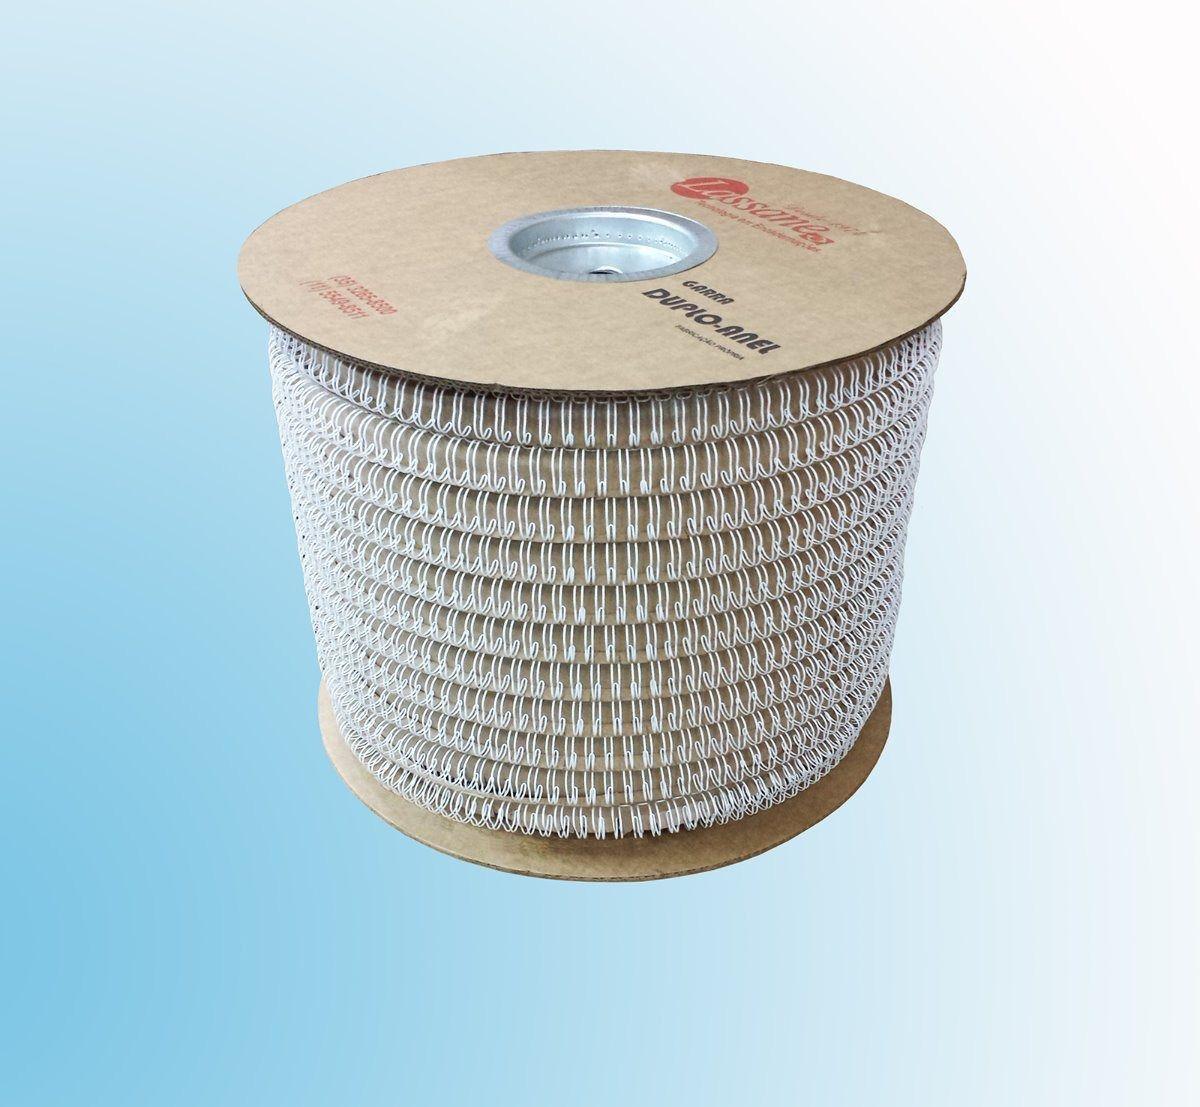 Bobina Espiral Garra Duplo Anel Wire-o 2x1 Diam 3/4 140 Fls